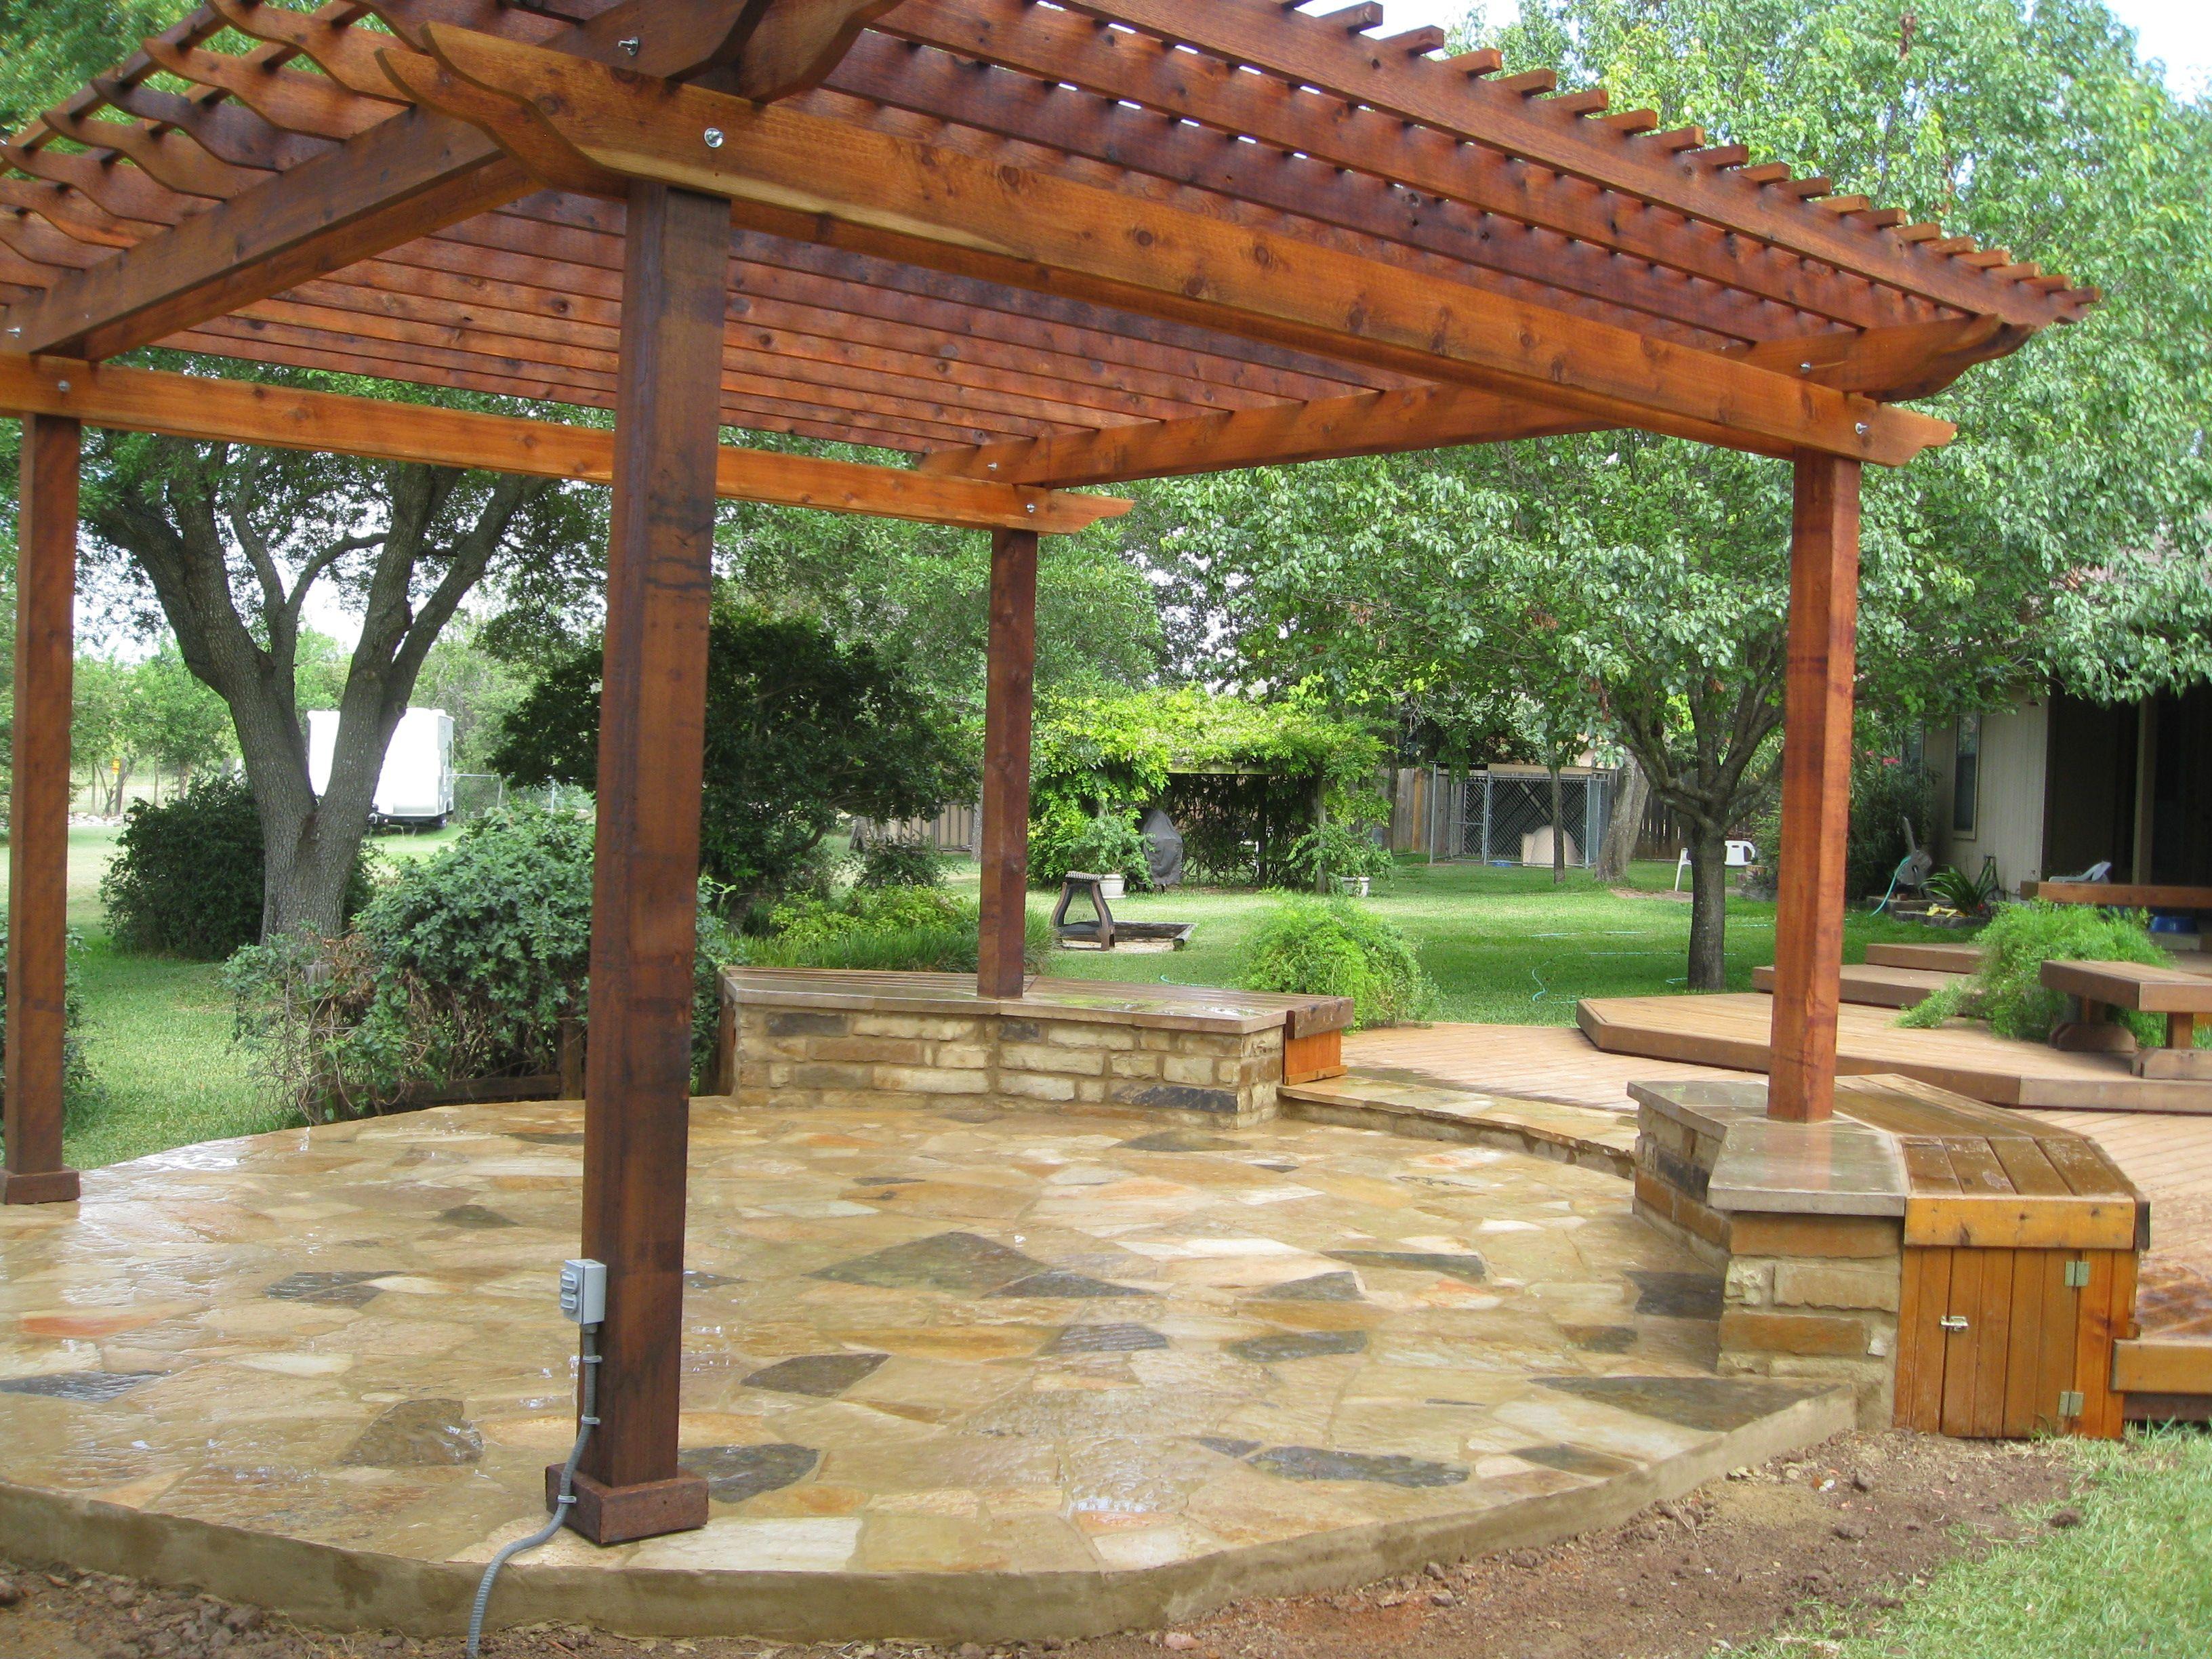 Oklahoma Flagstone Patio constructed by OL' Yeller ...